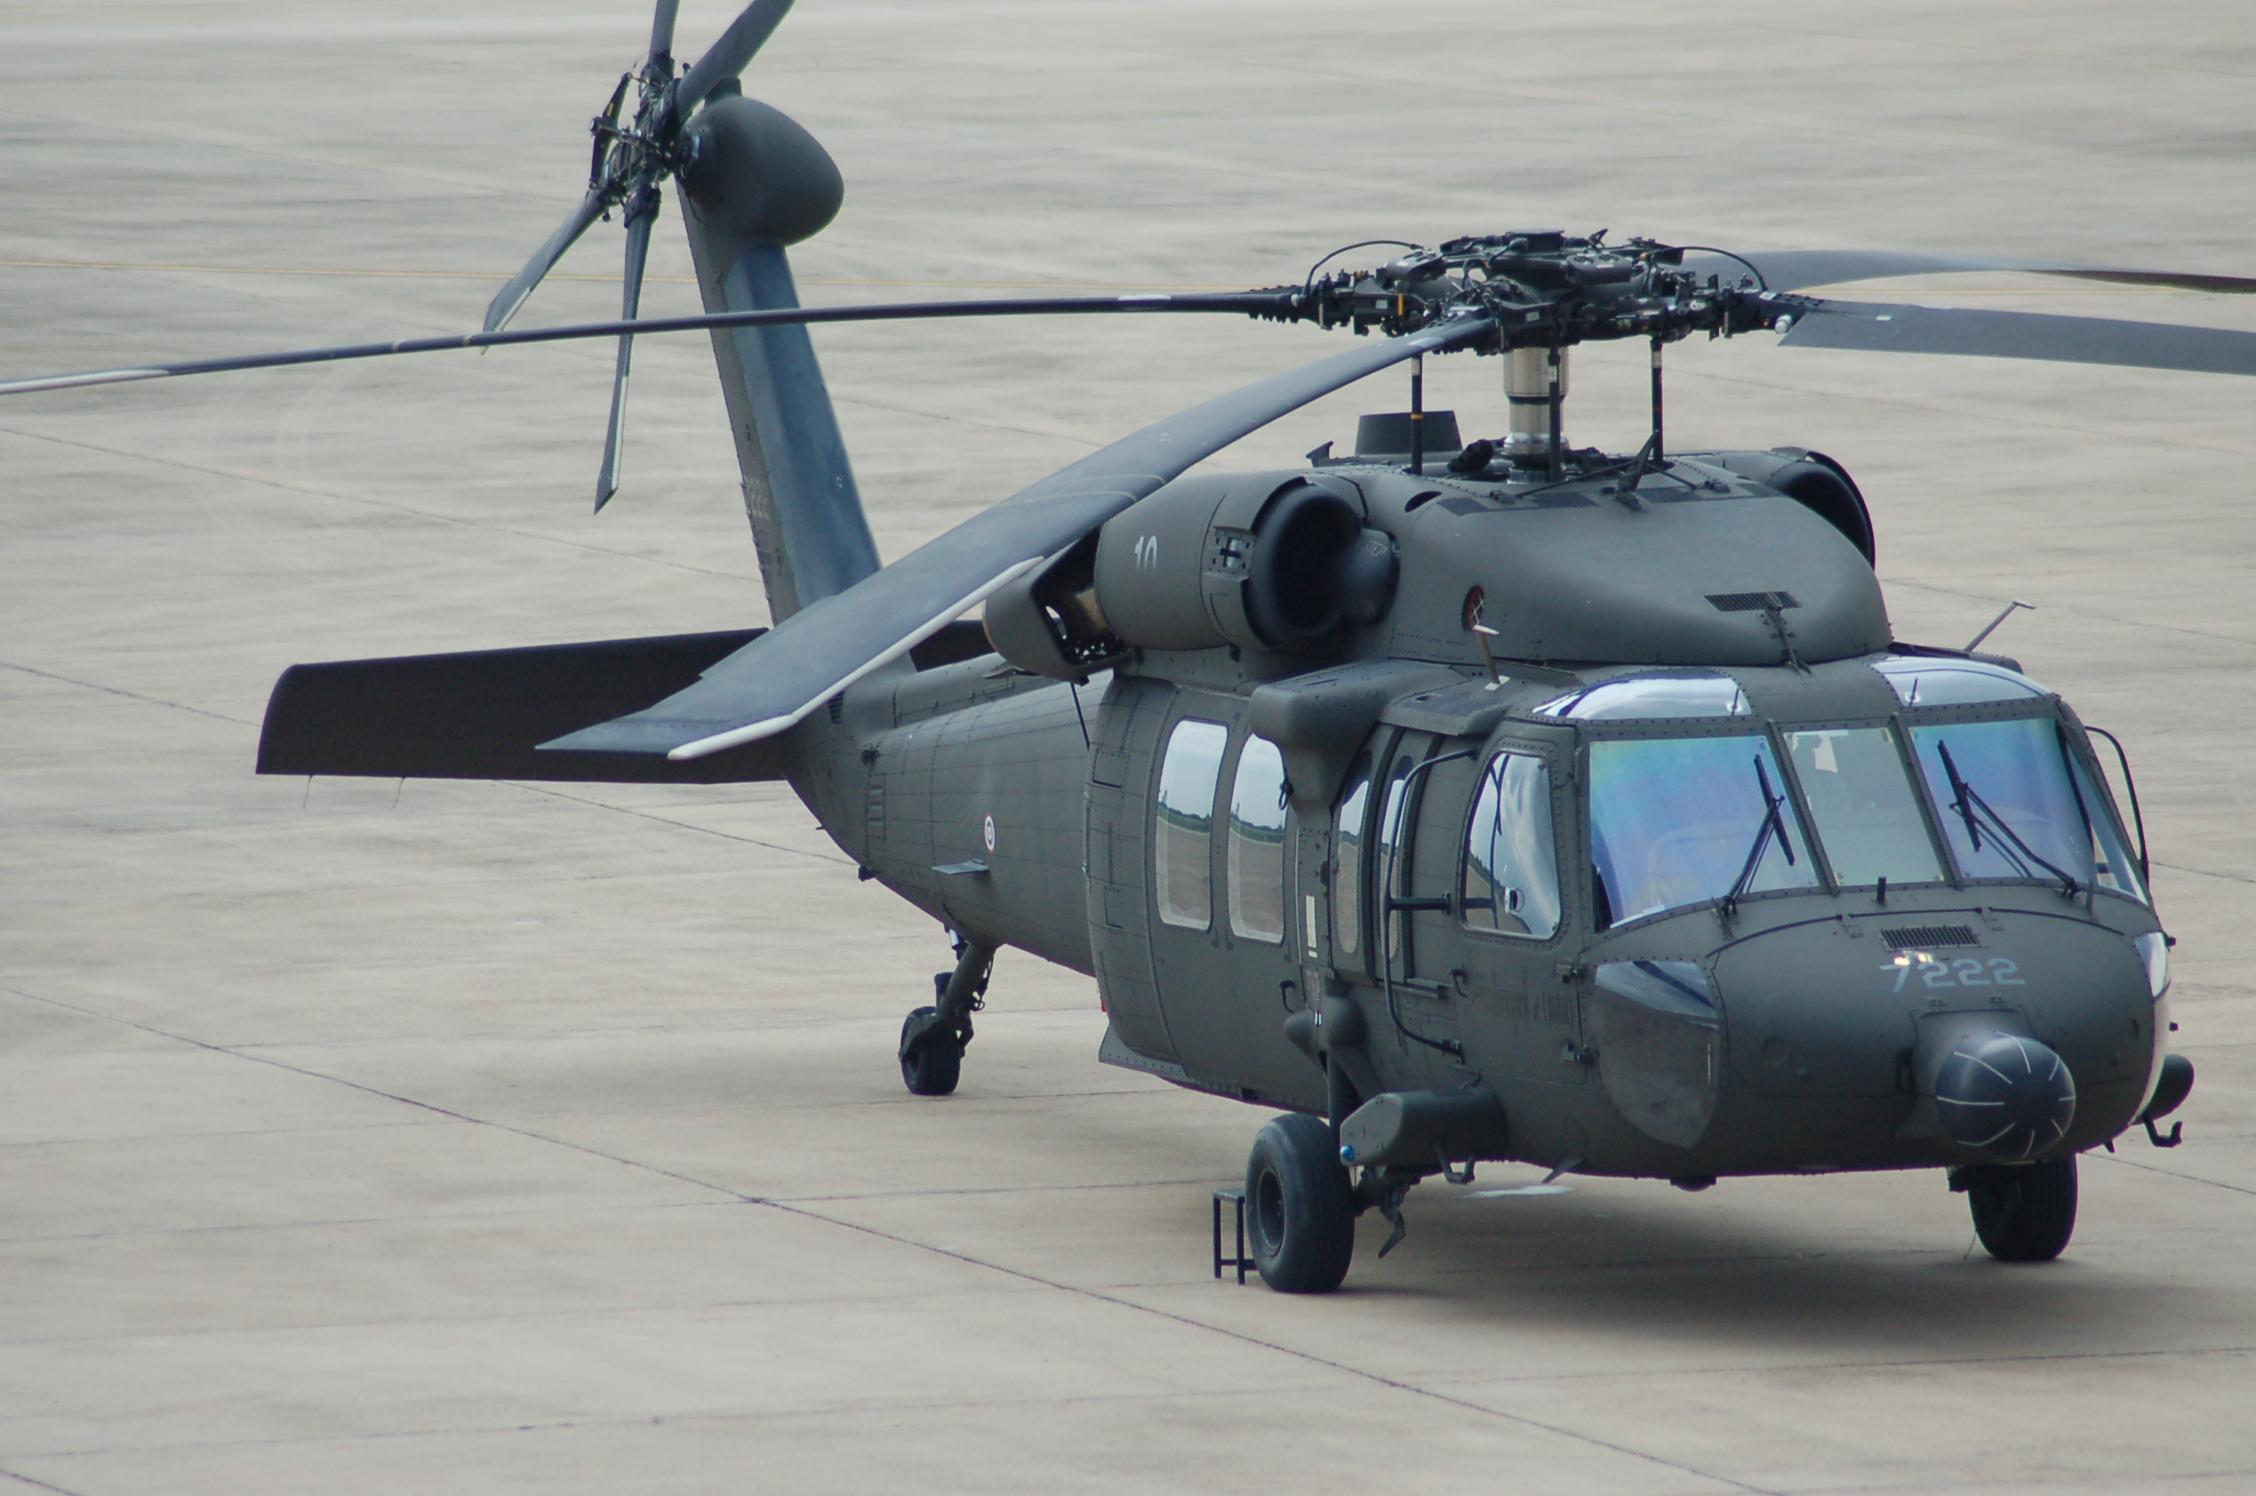 File:Sikorsky UH-60 Blackhawk of the Royal Thai Army at Khon Kaen (8876686169) (2).jpg - Wikimedia Commons